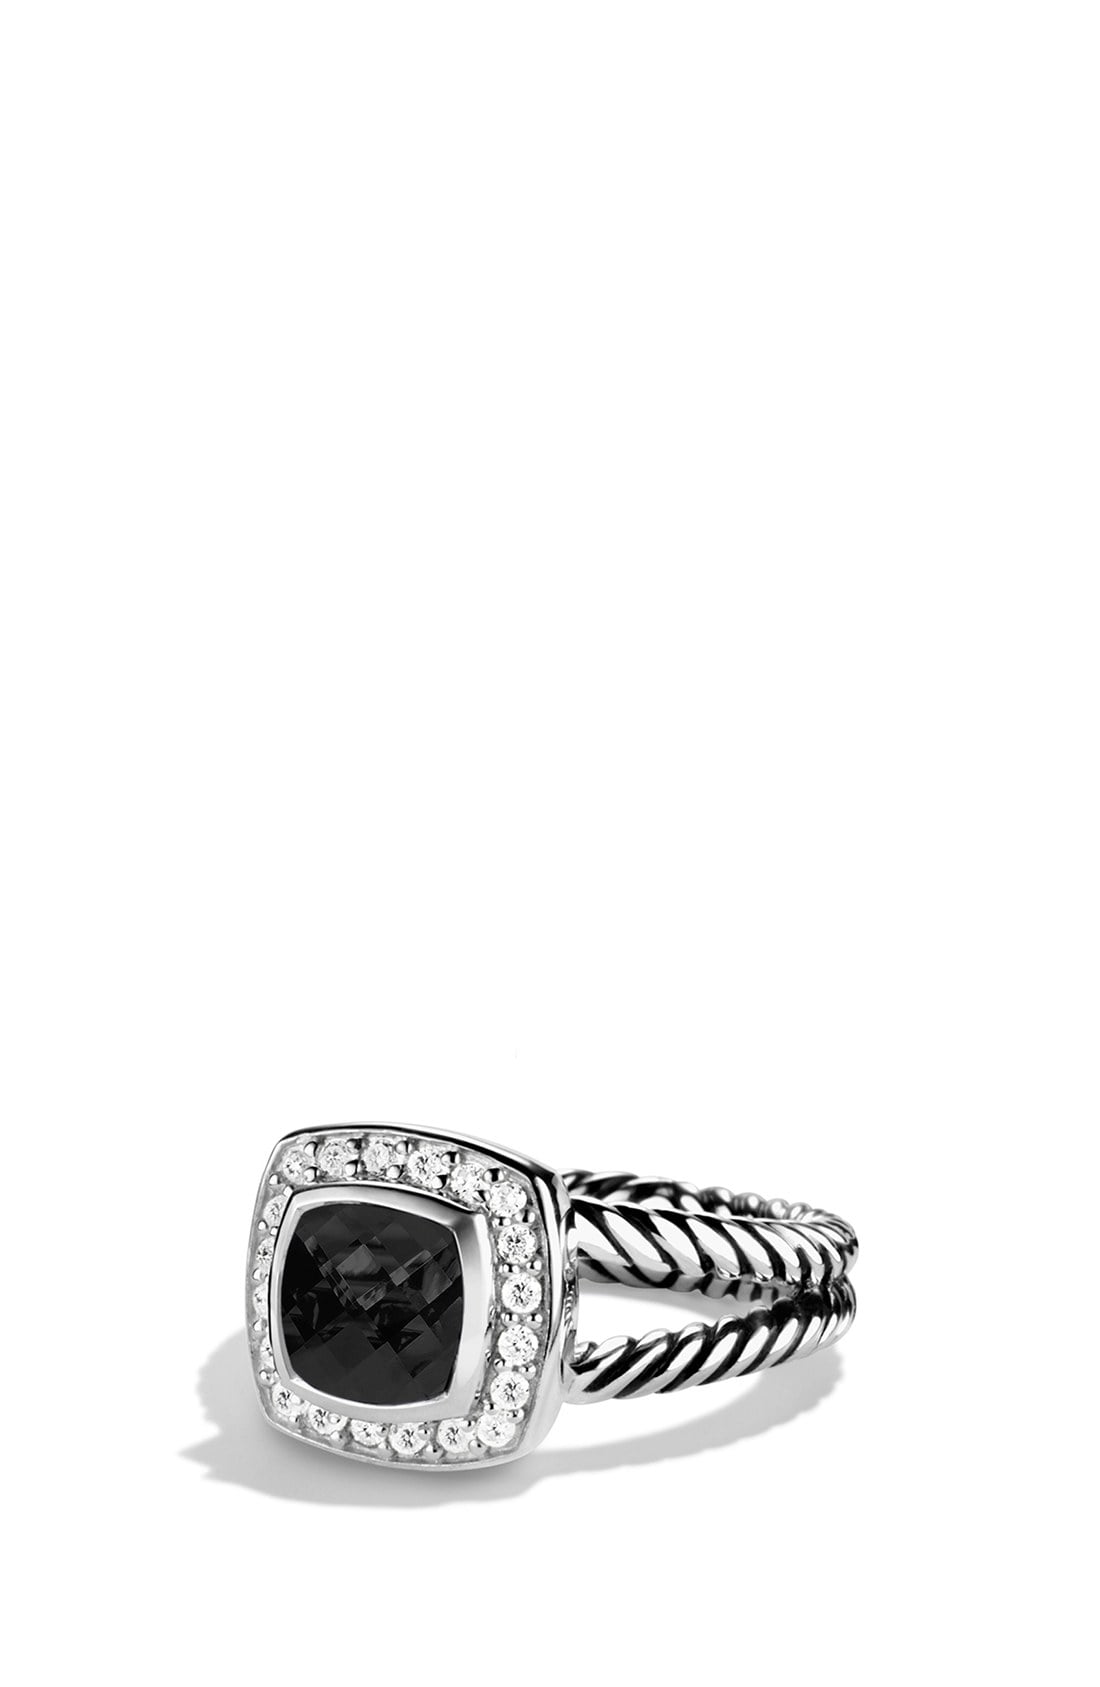 David Yurman Silver Jewelry